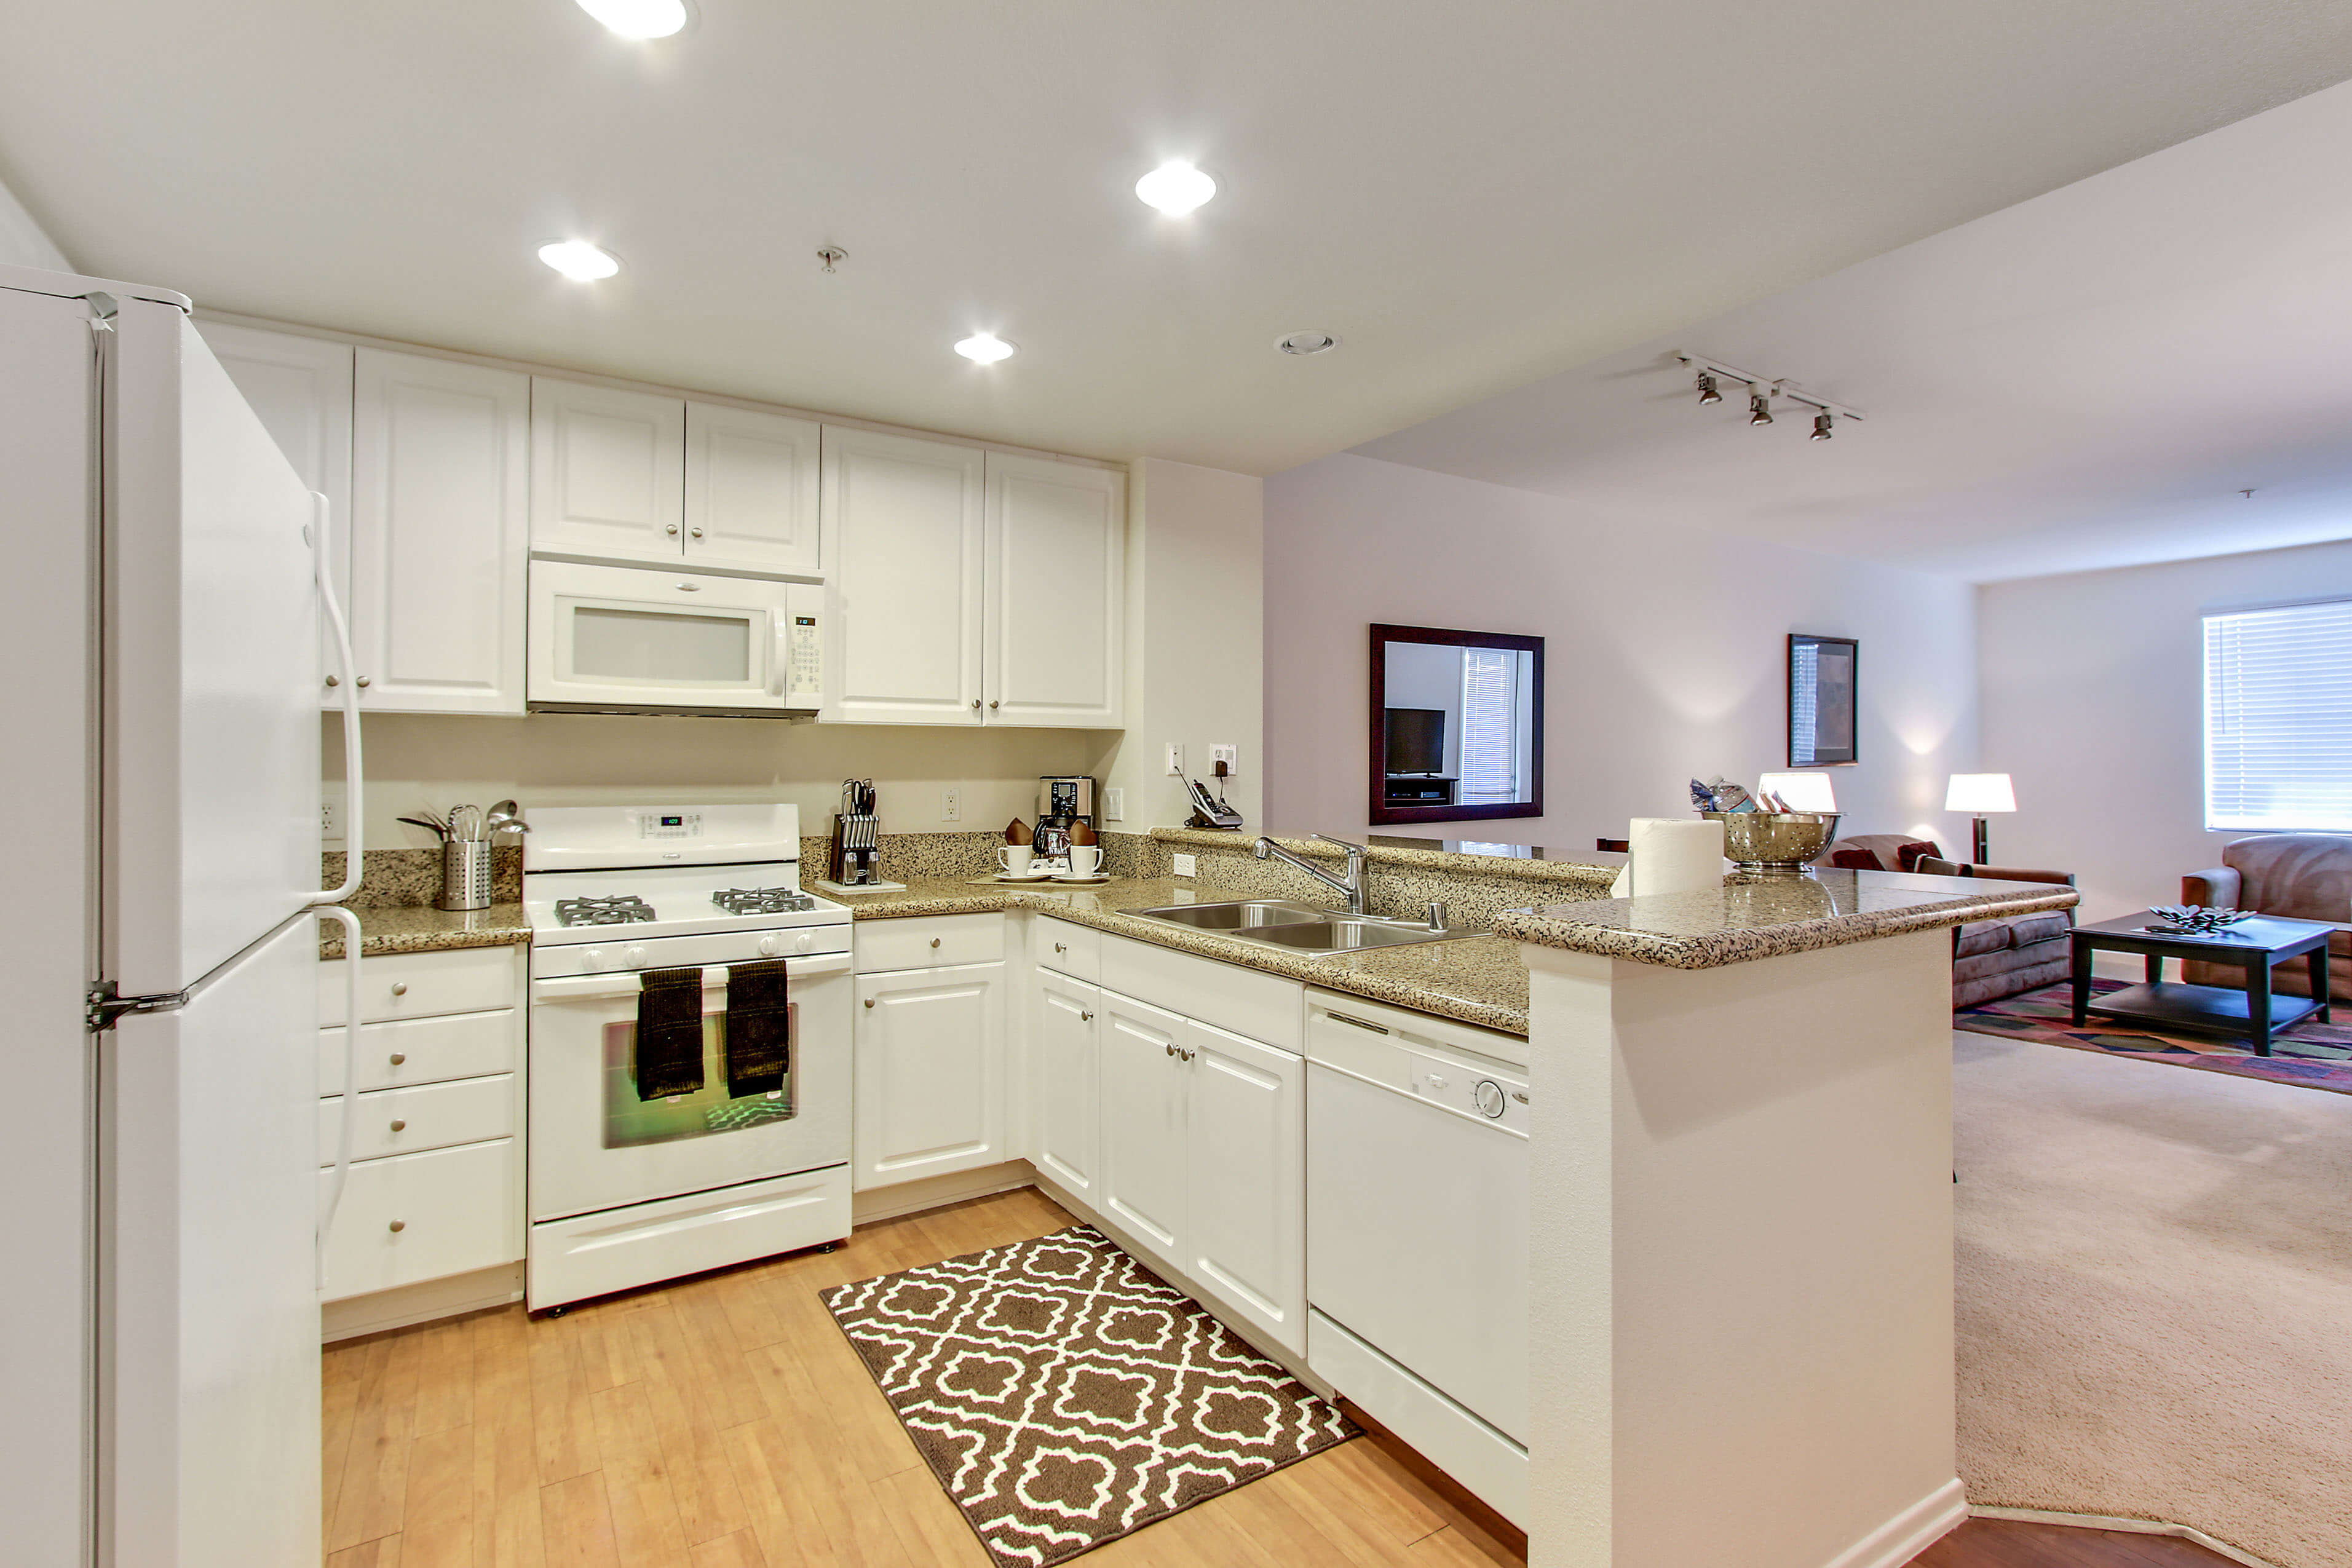 irvine furnished 1 bedroom apartment for rent 4980 per